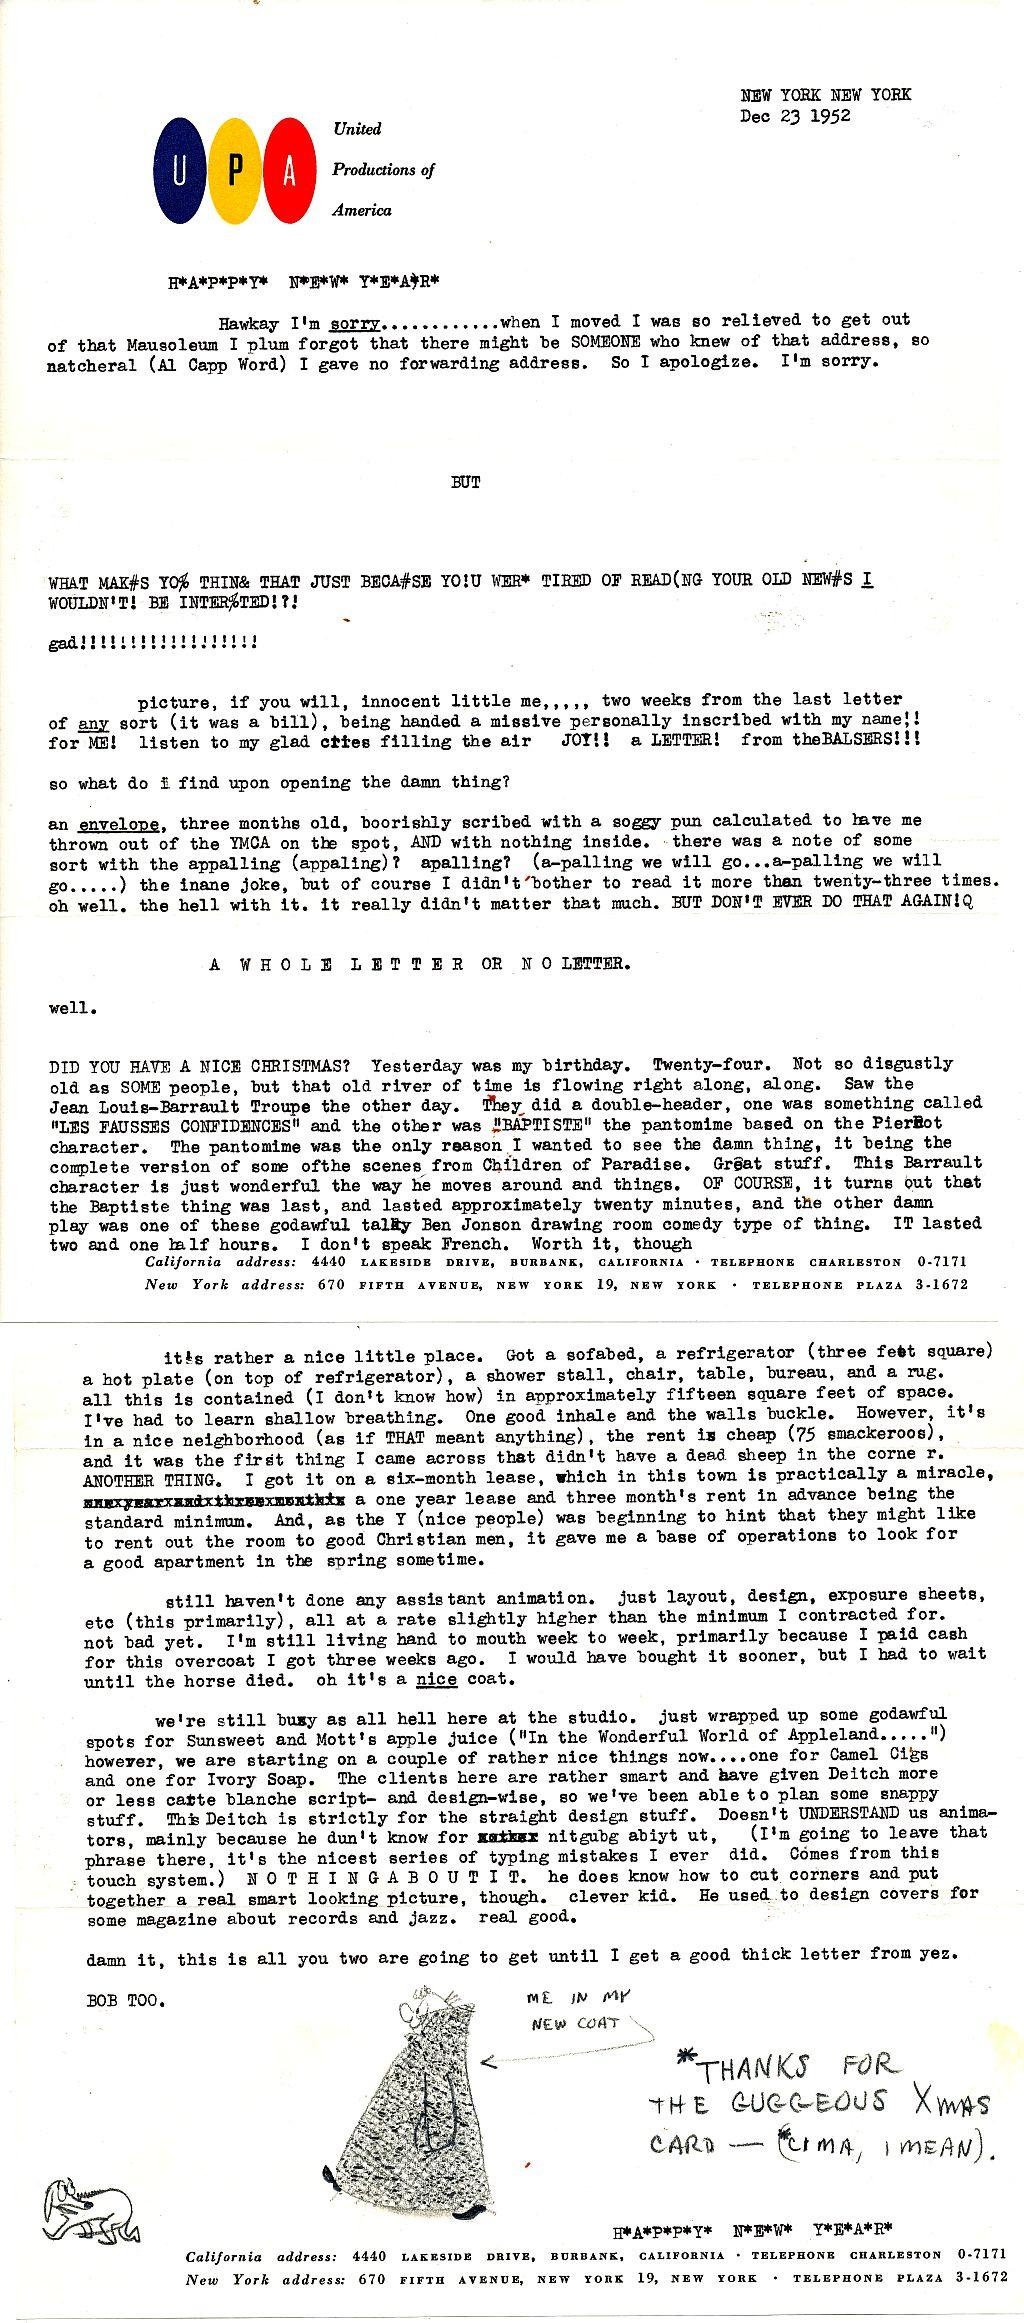 duane-letter-12-23-52-stitch.jpg